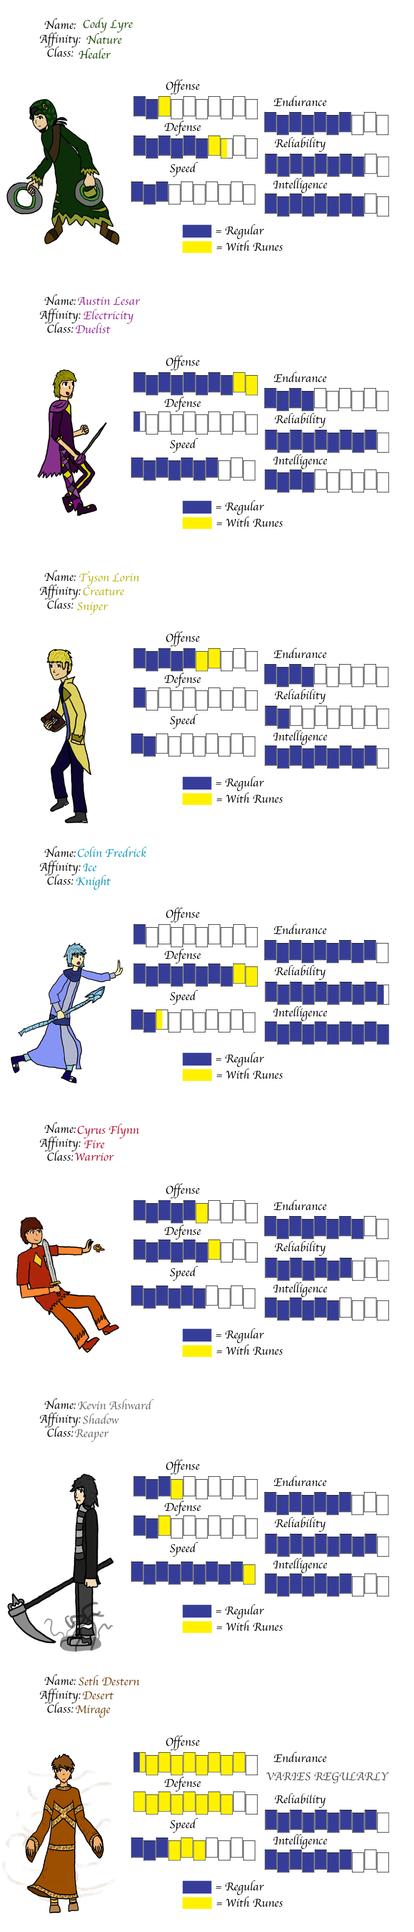 Wizards of Ethune: Stats [READ DESCRIPTION] by companioncube99